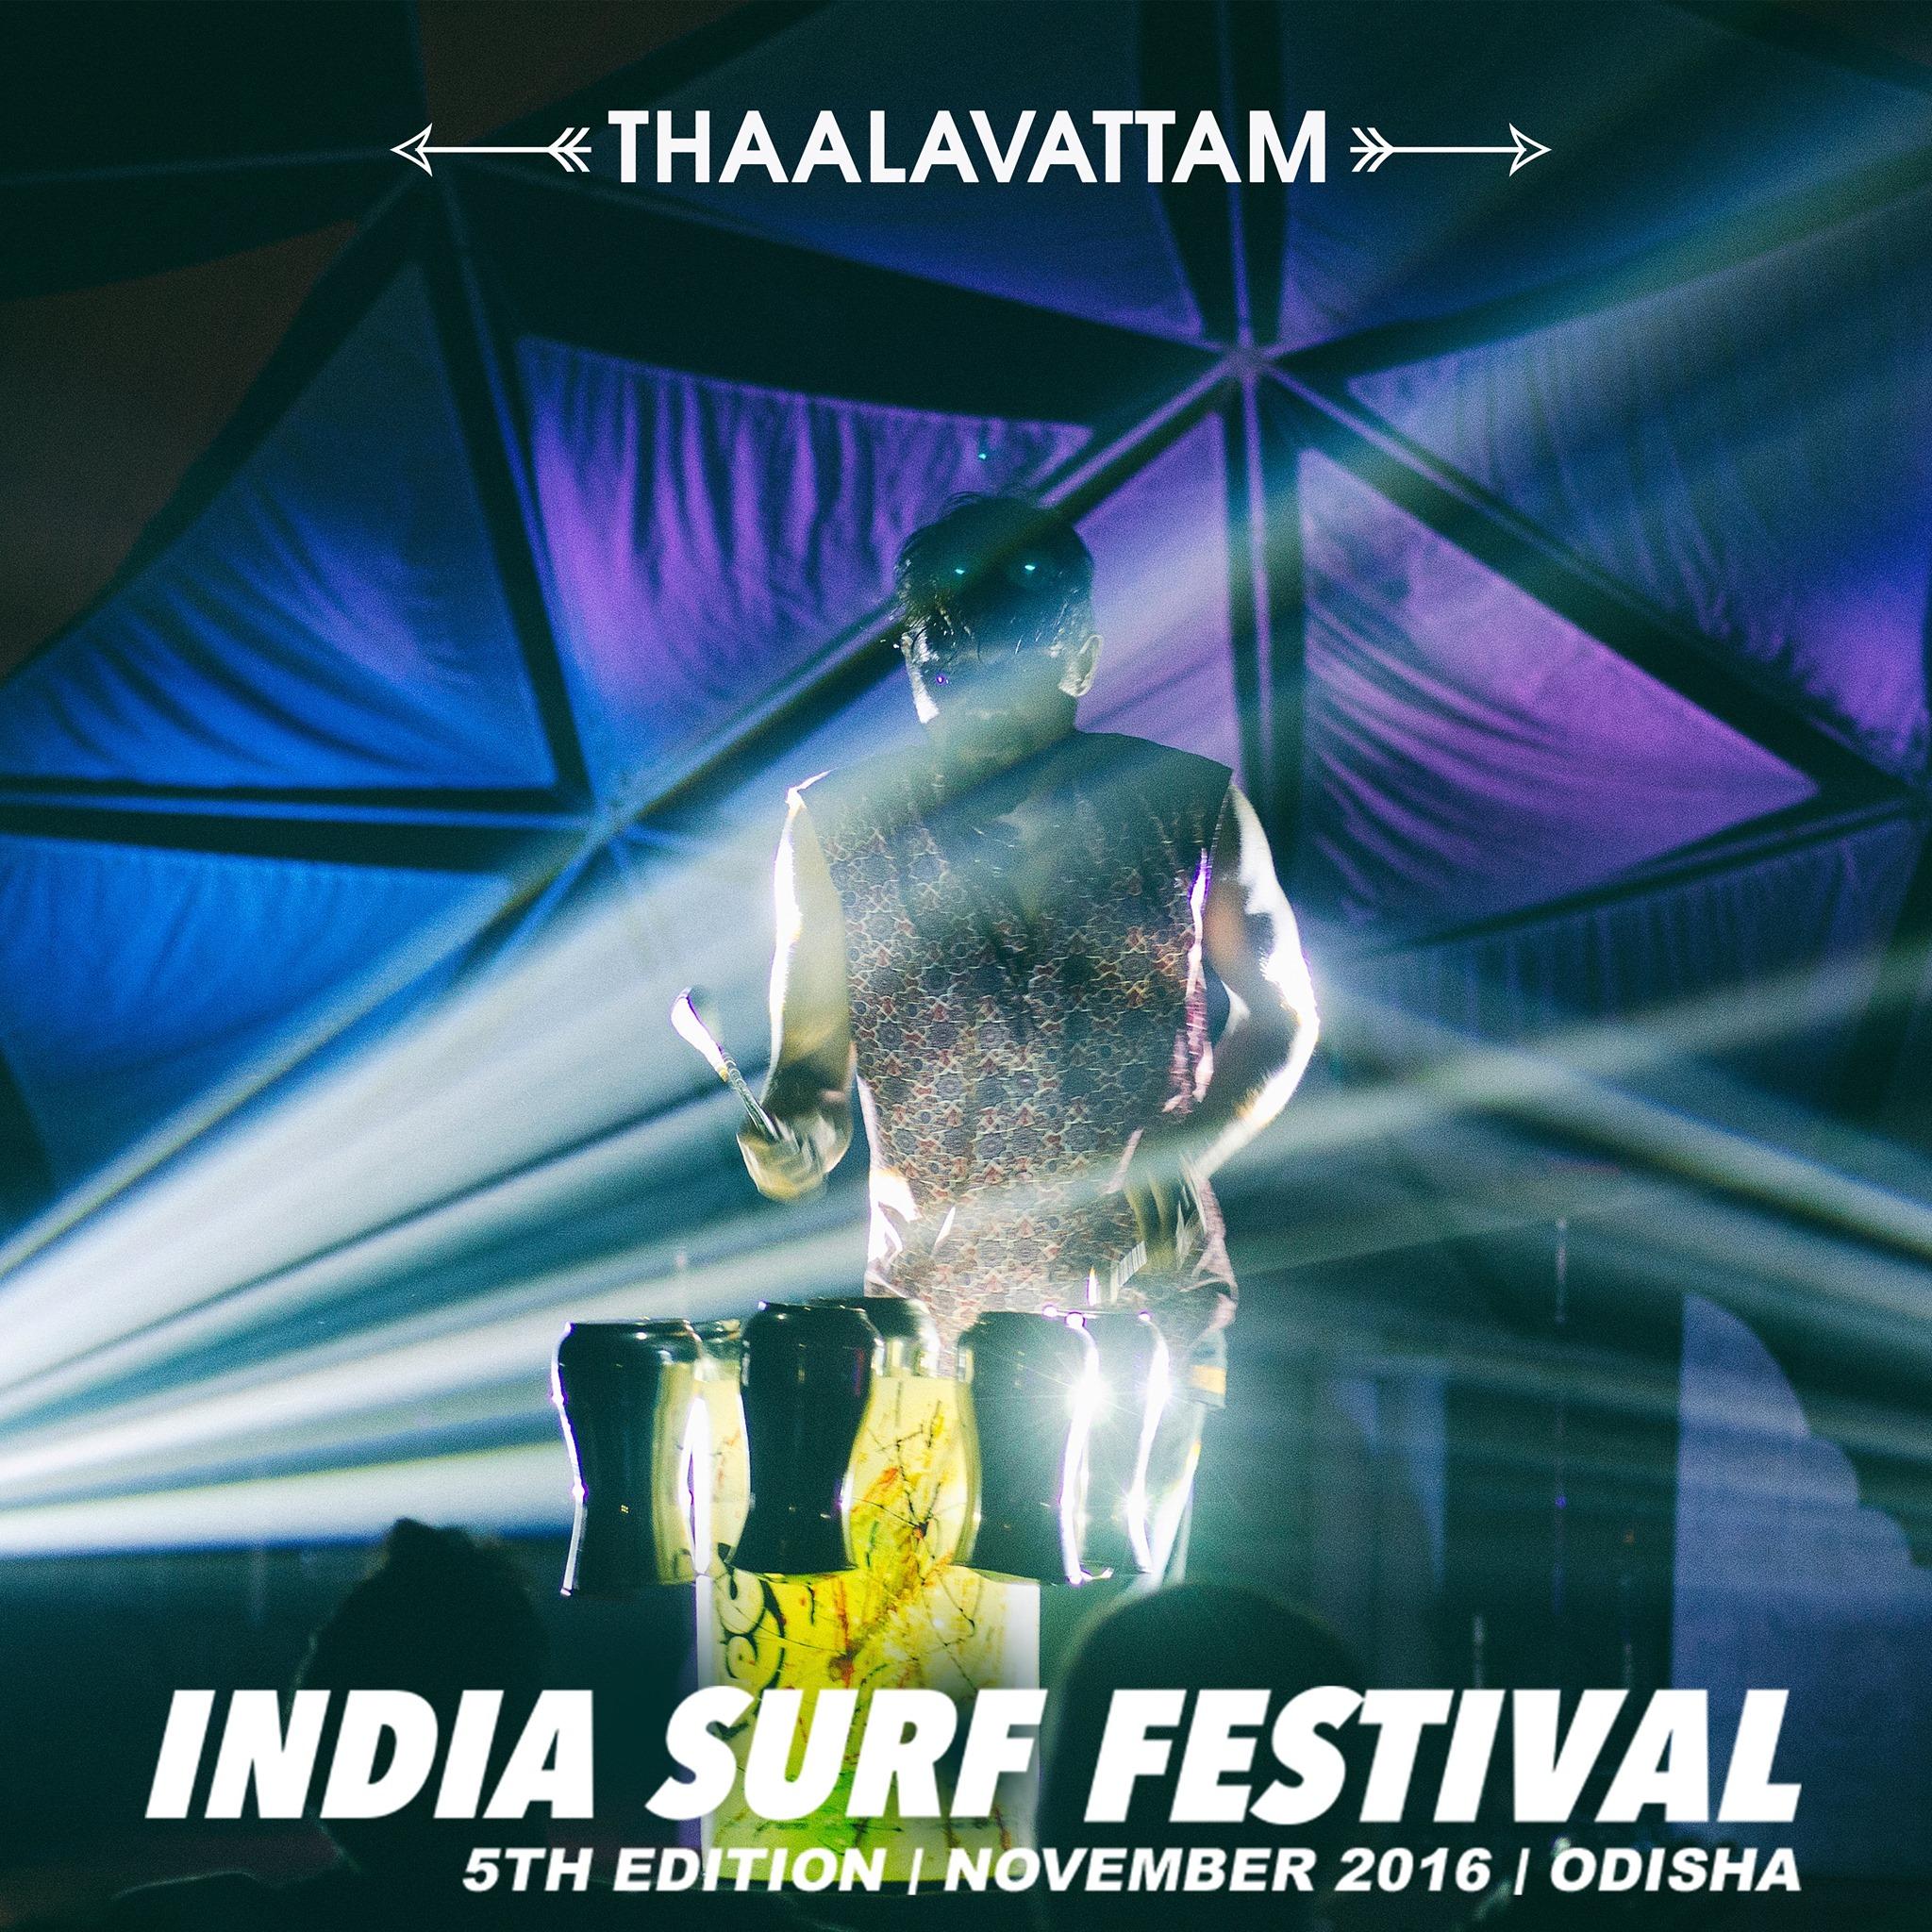 Thalavattam india surf festival bhubaneswar buzz